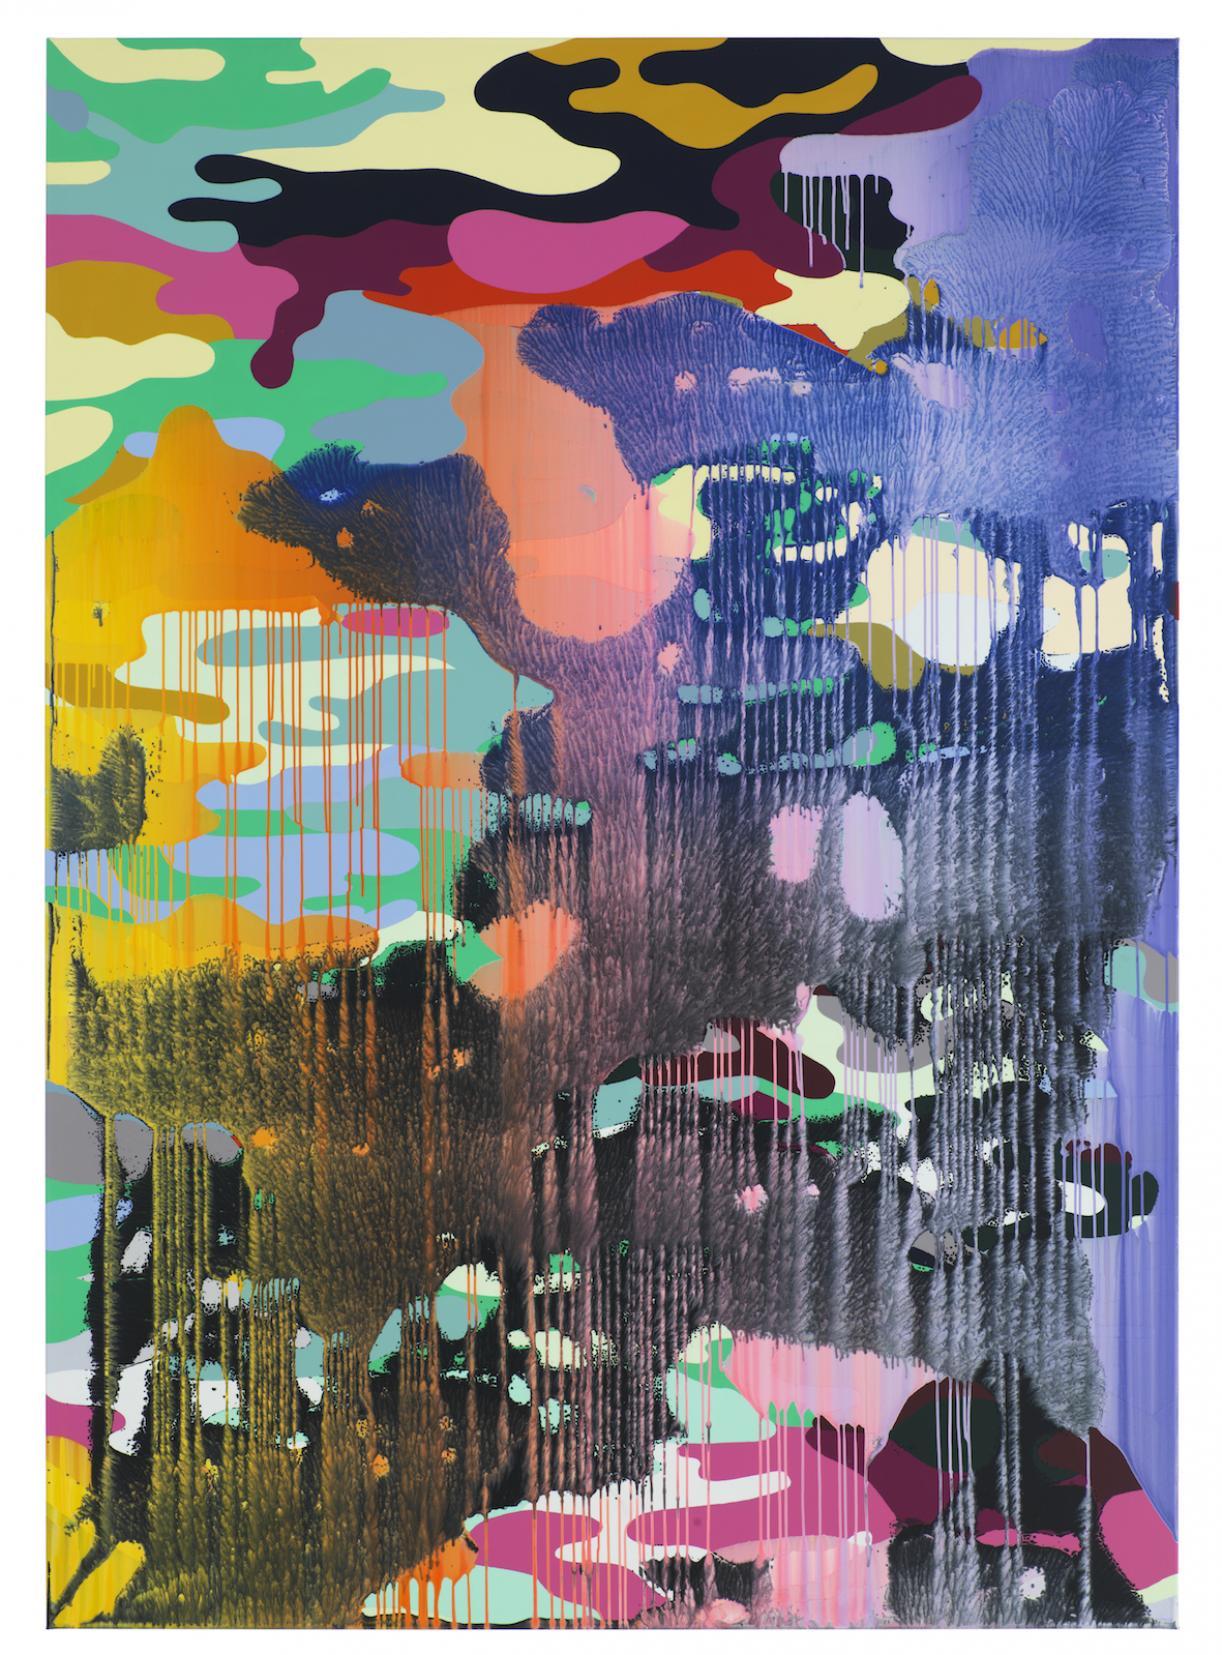 Christine Streuli, Warainting_001, 2016/17, Mixed media on canvas, 243,5 x 173 cm